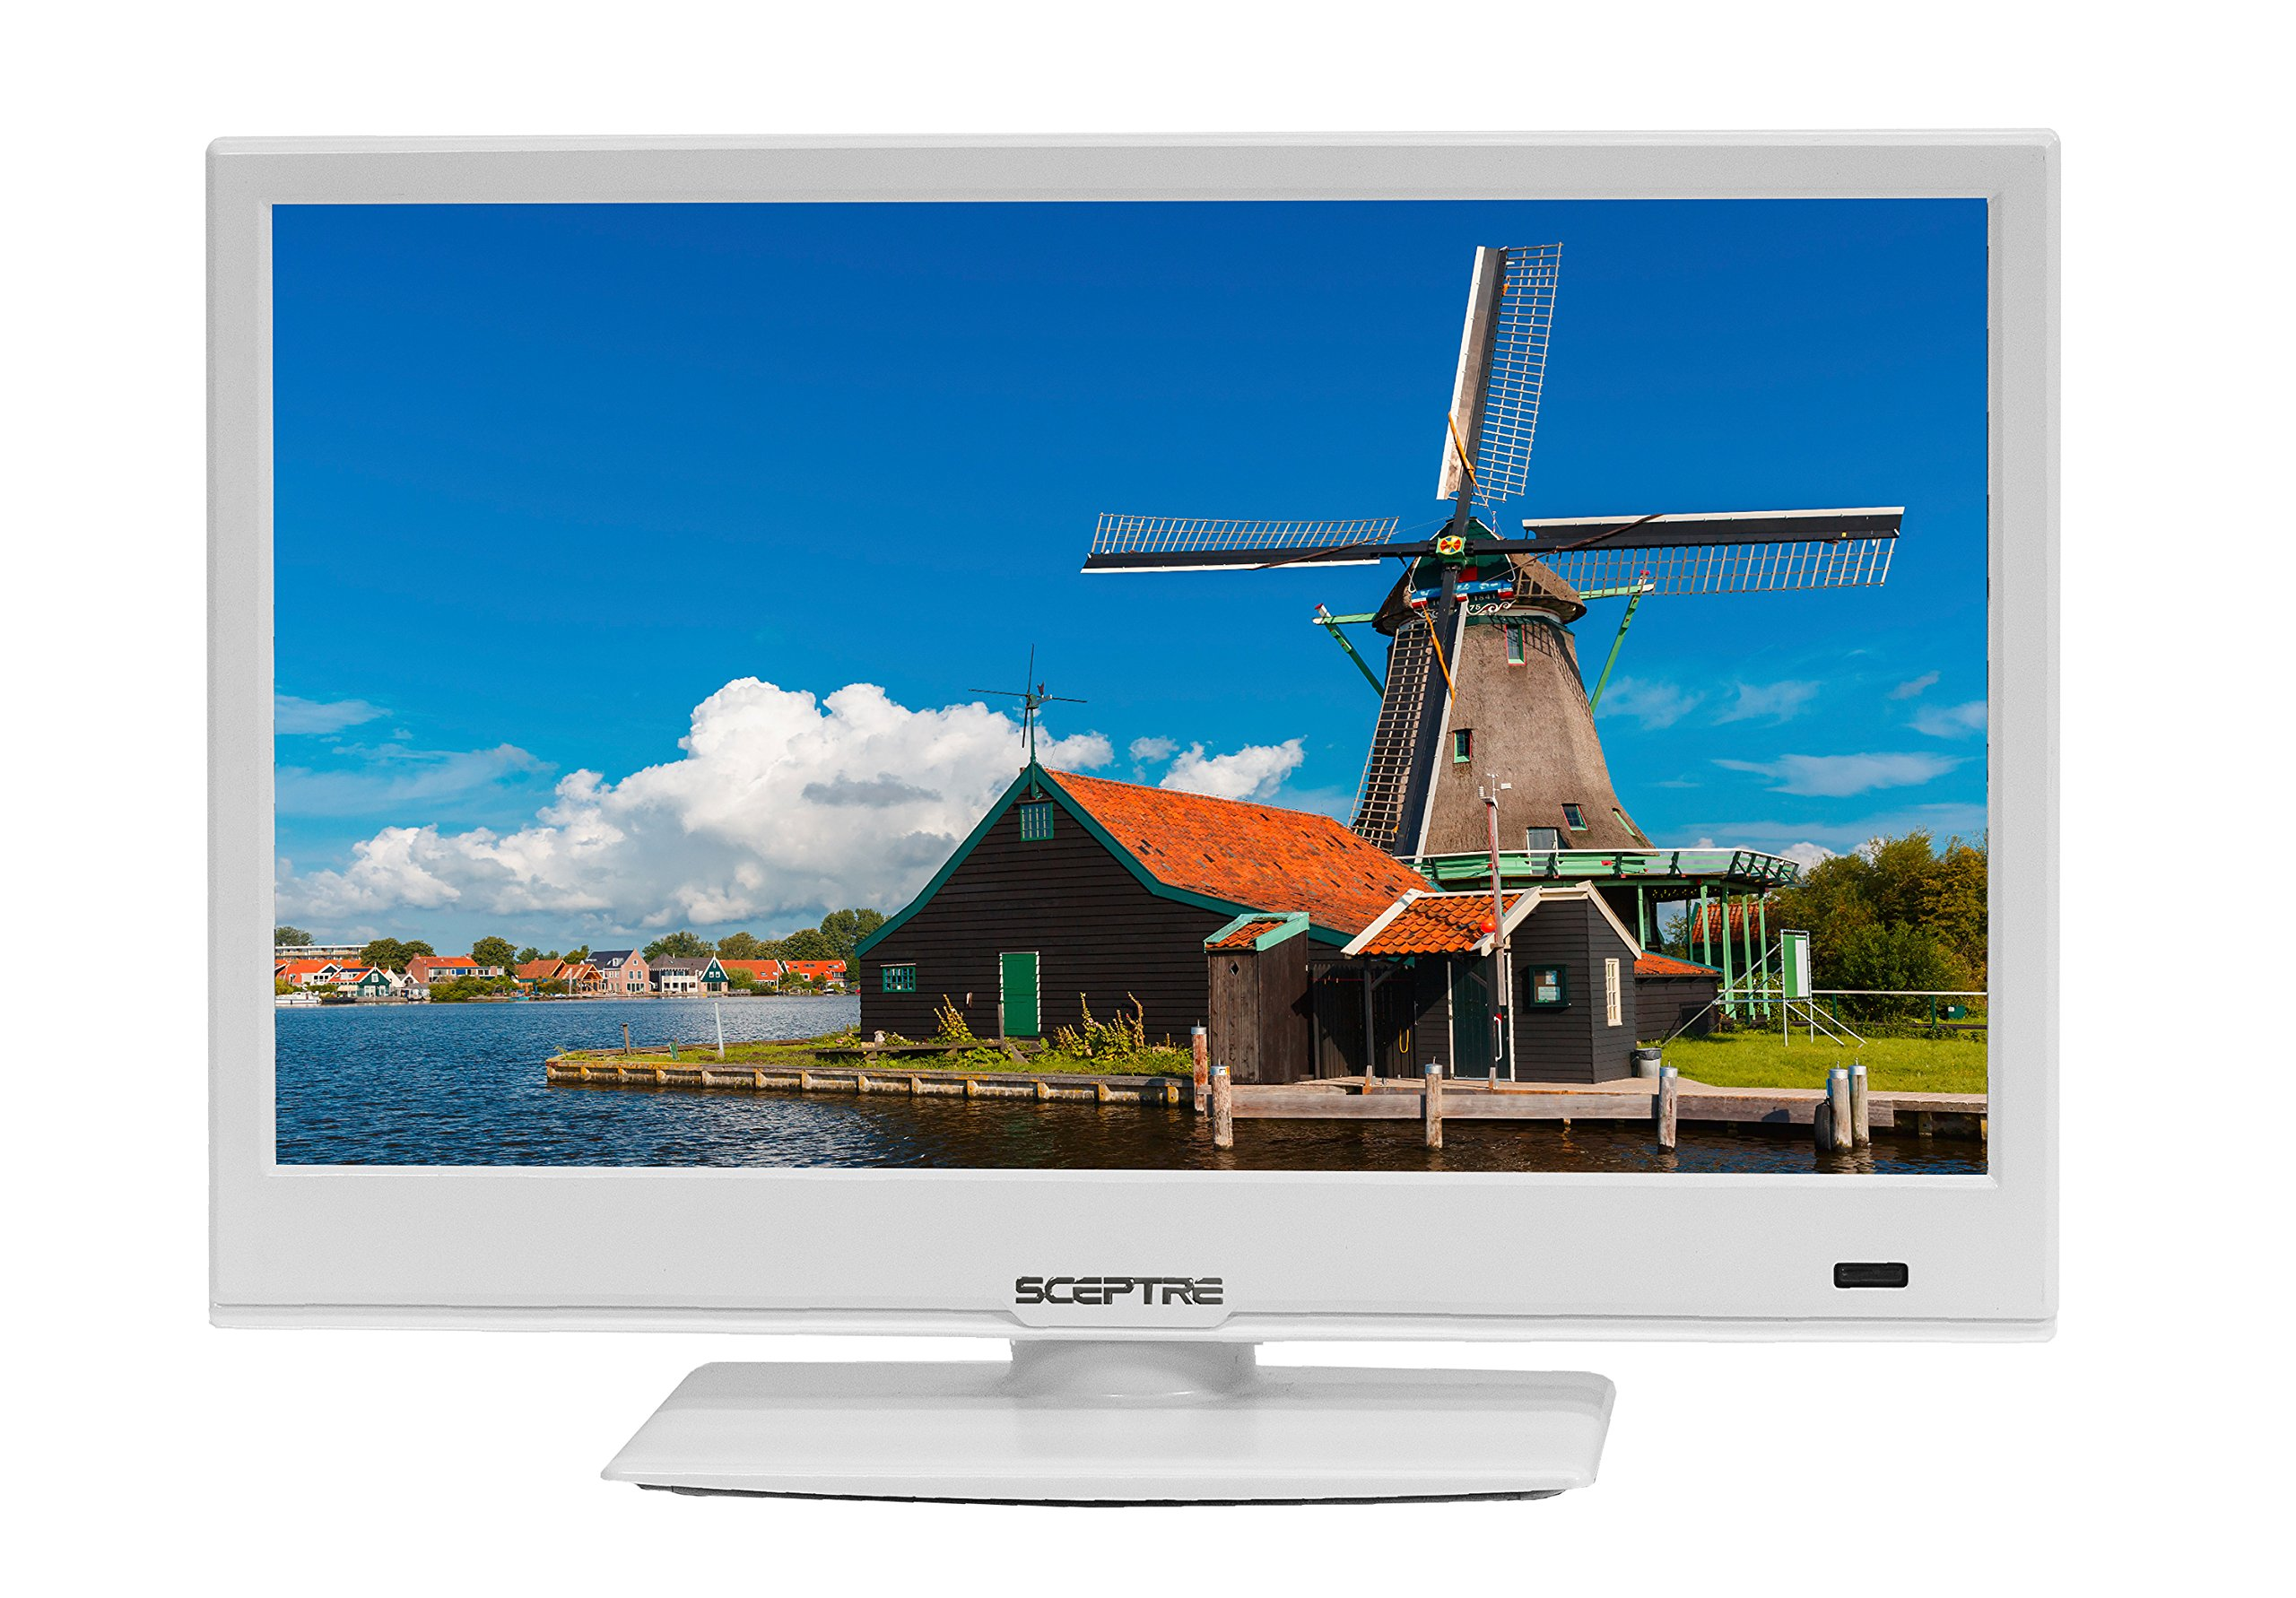 Sceptre 16 Inches 720p LED TV E168WV-SS (2017)